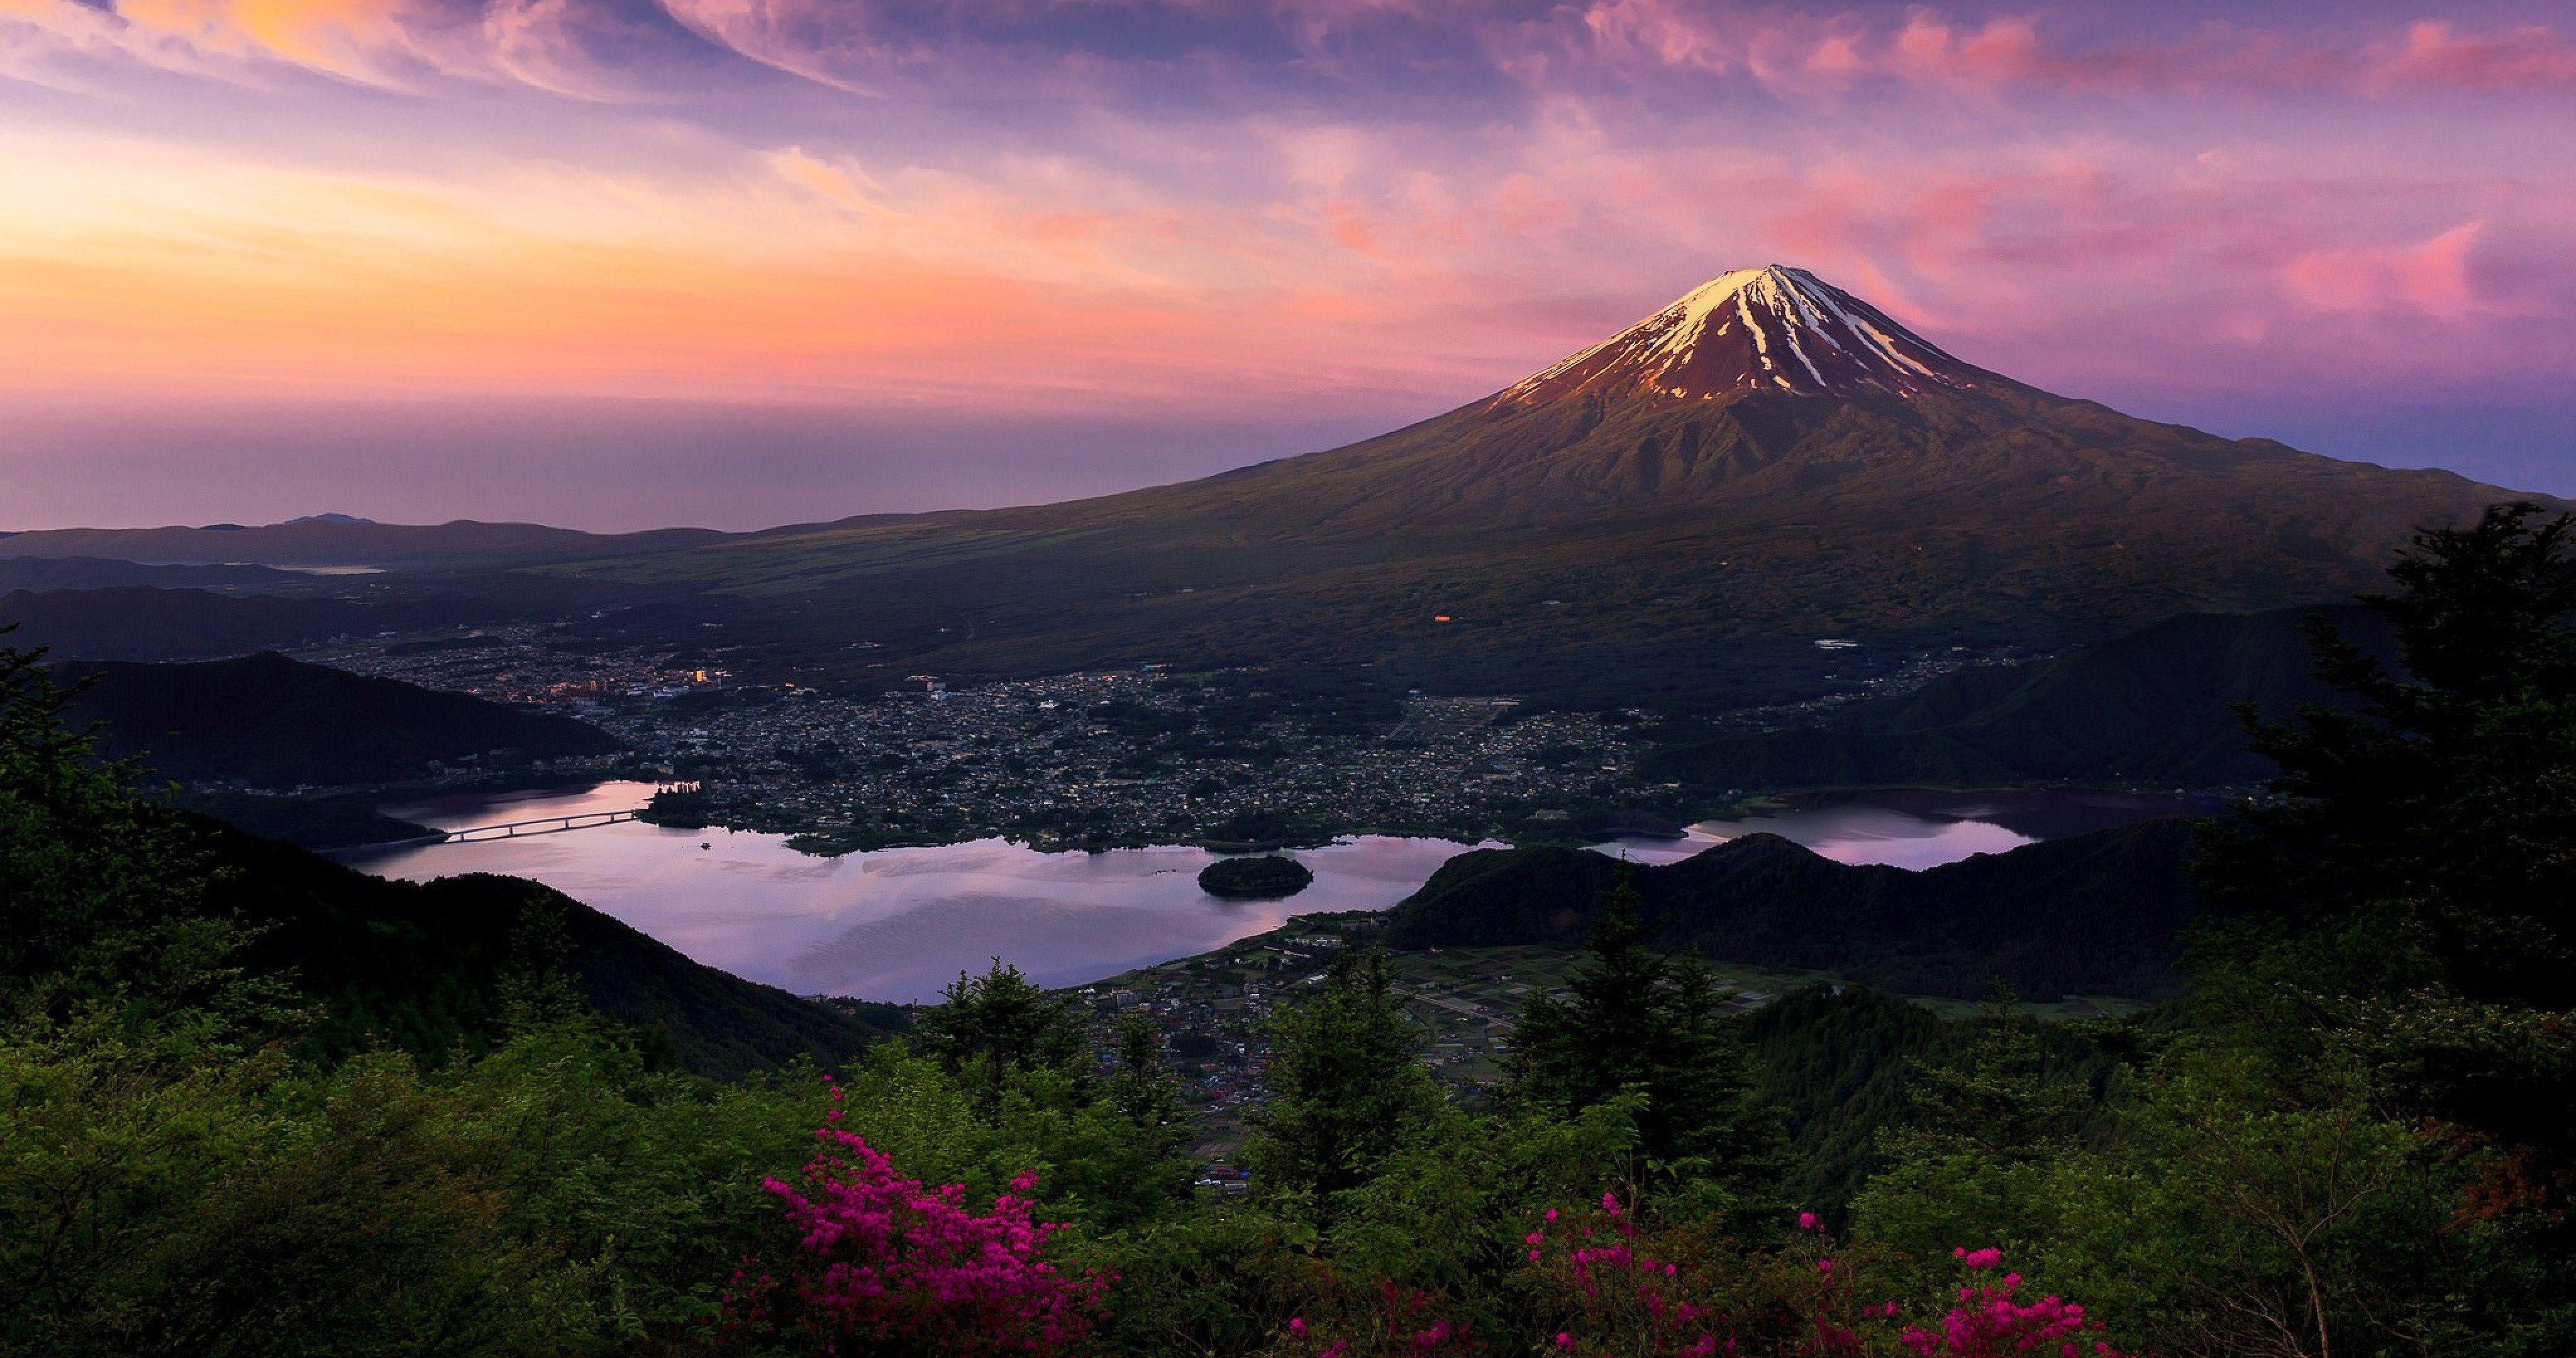 Japan Honshu Island 4k Ultra Hd Wallpaper Japanese Mountains Island Wallpaper Mount Fuji